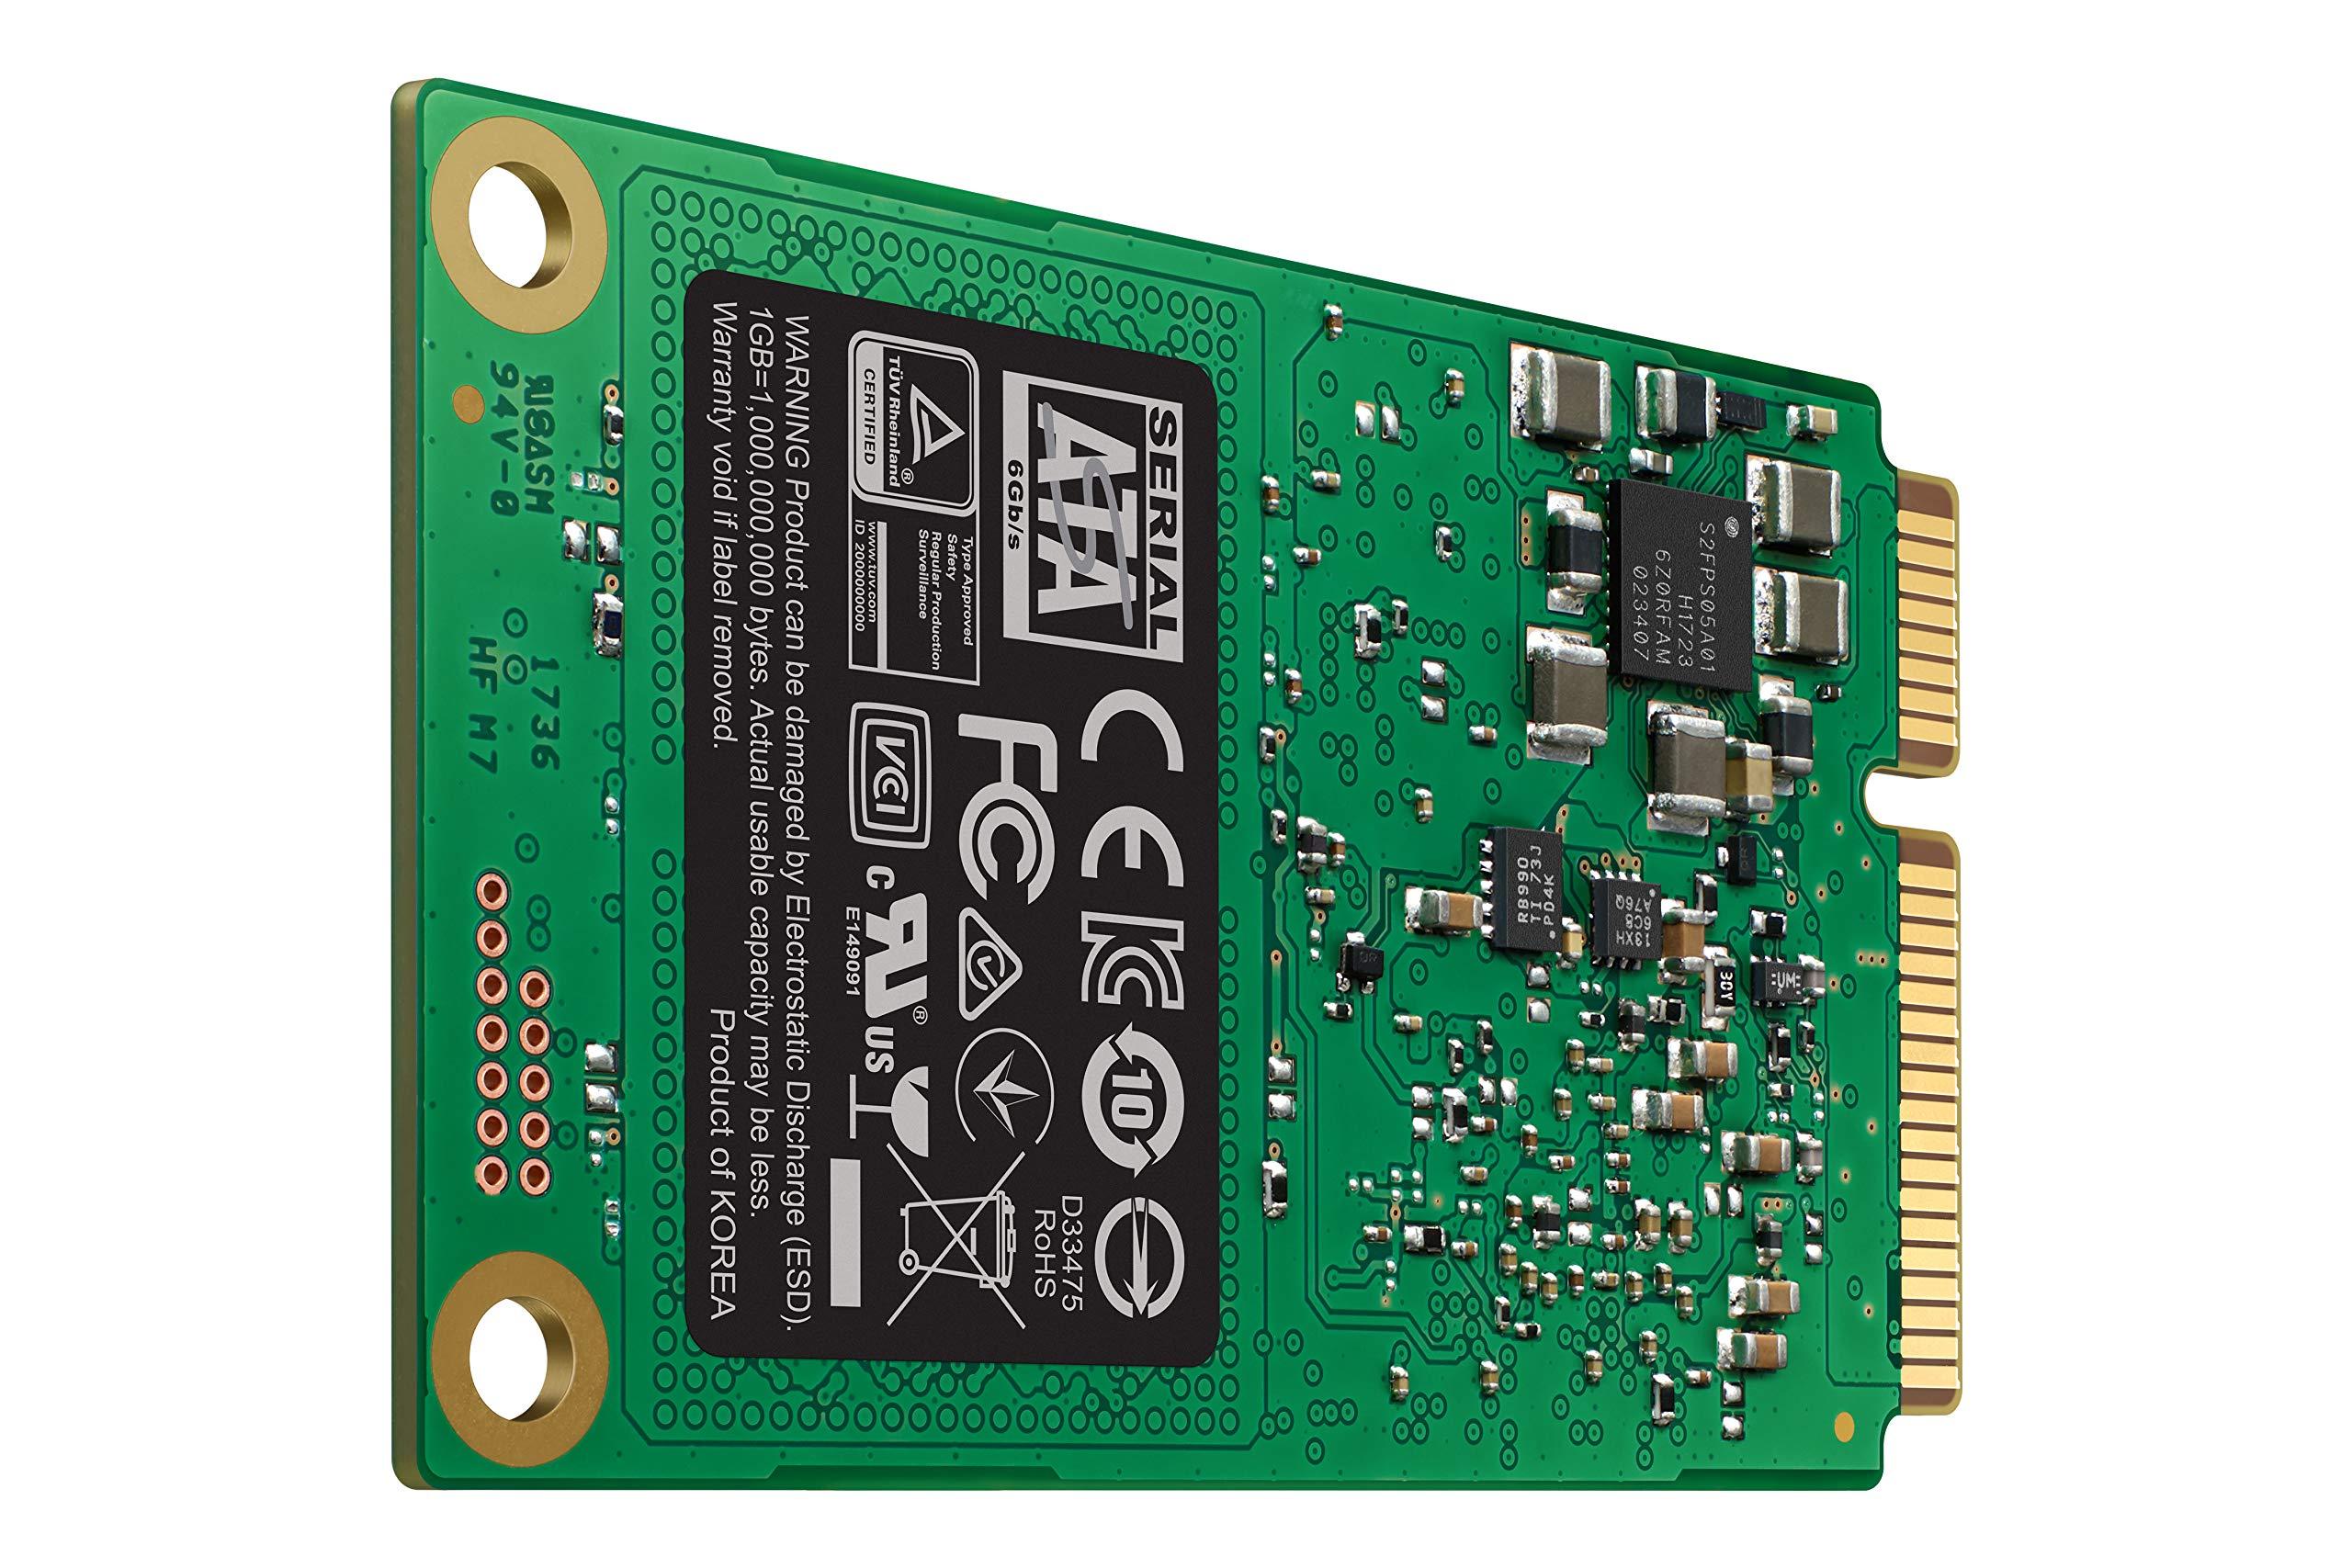 Samsung SSD 860 EVO 1TB mSATA Internal SSD (MZ-M6E1T0BW) by Samsung (Image #14)